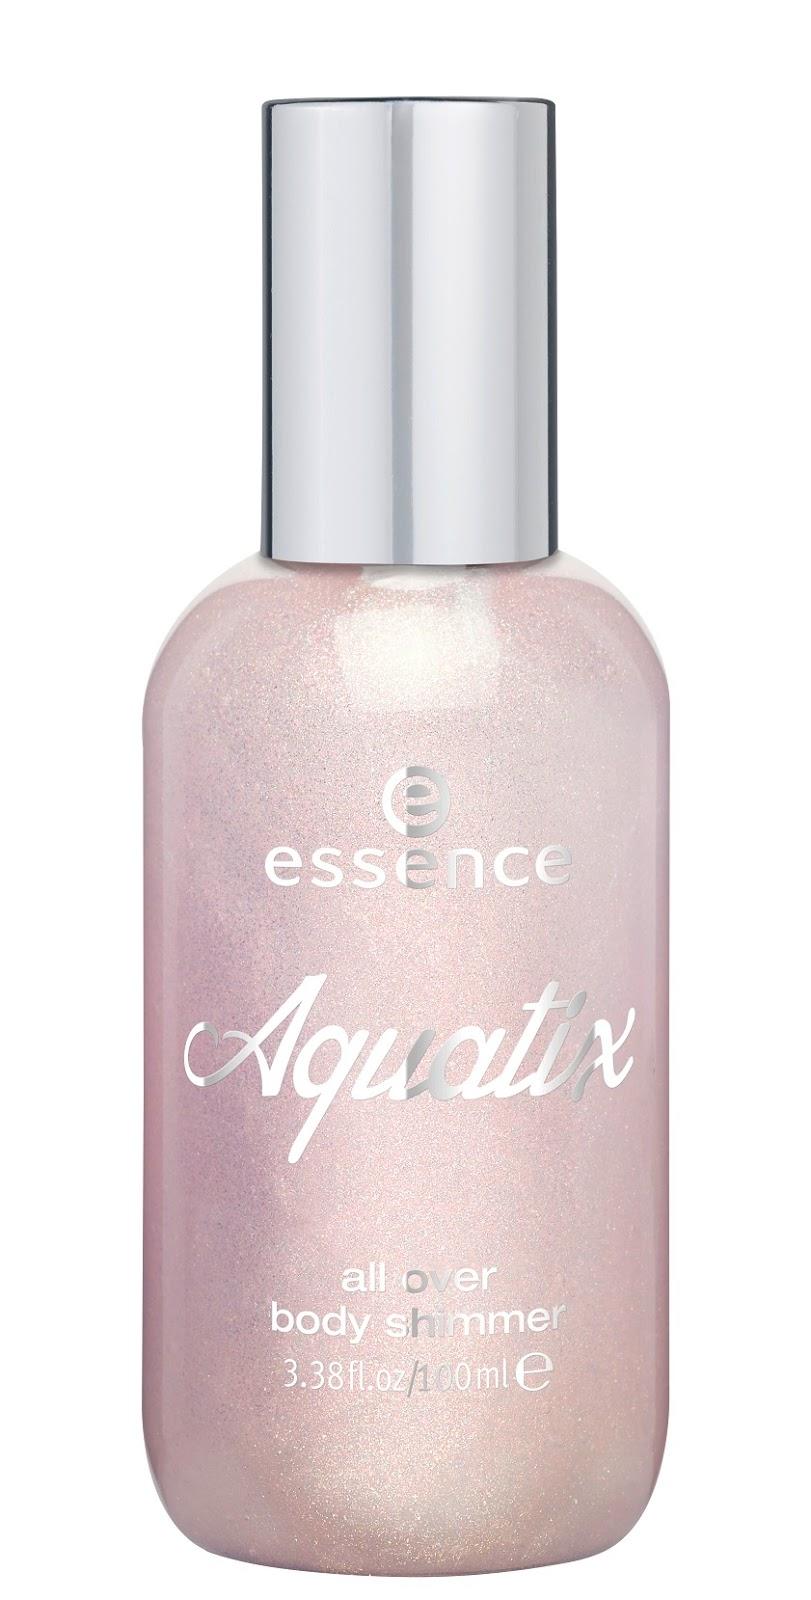 essence aquatix – all over body shimmer